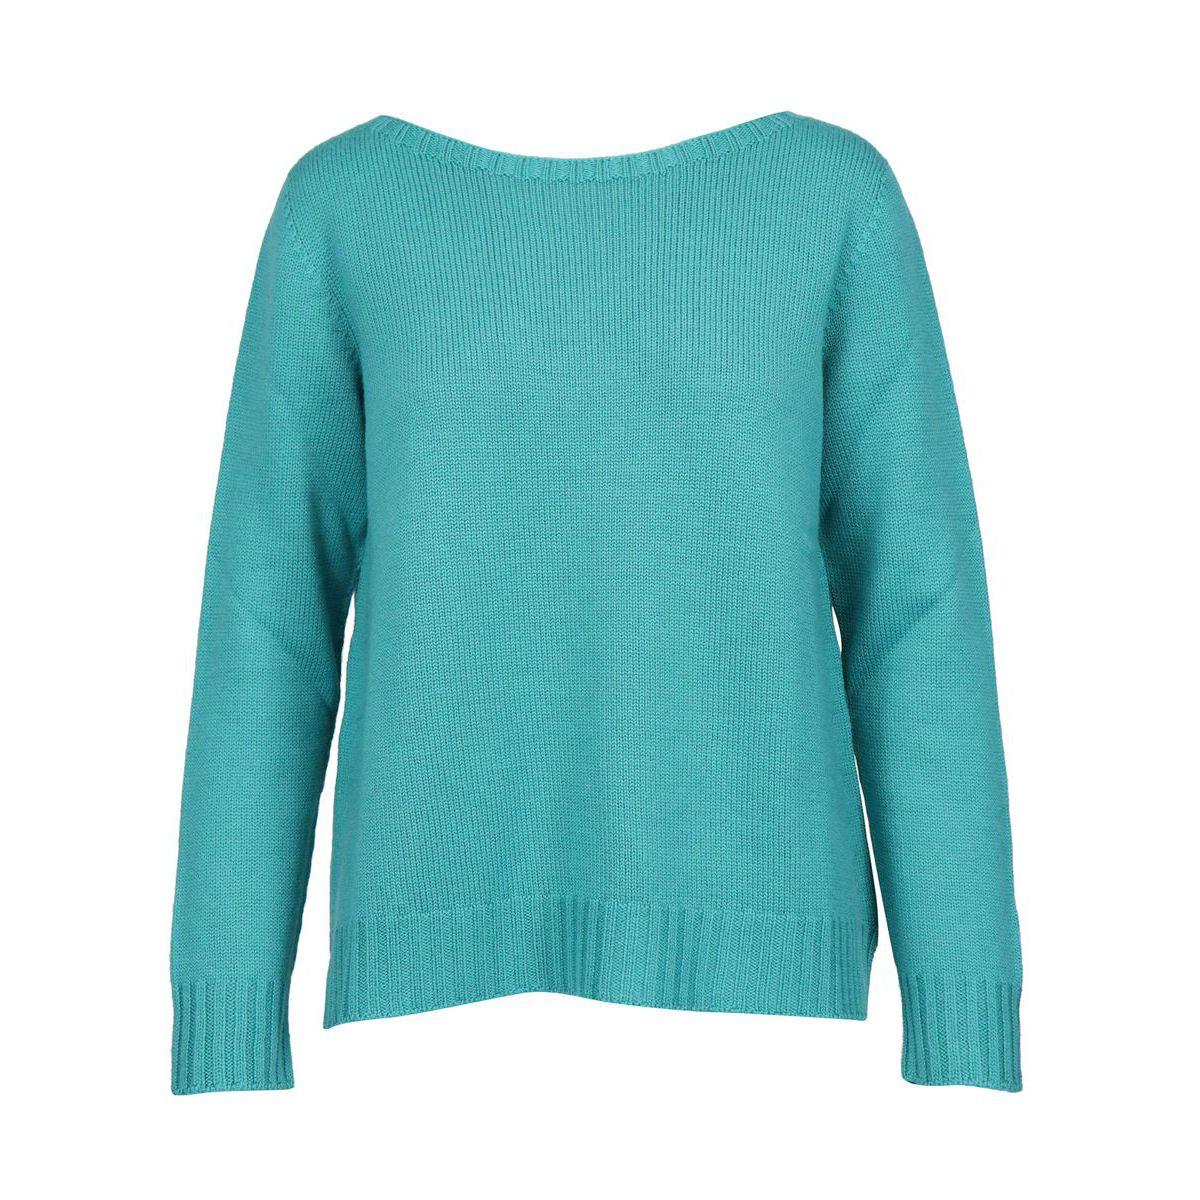 Sweater in shaved marinara virgin wool Green water Gran Sasso